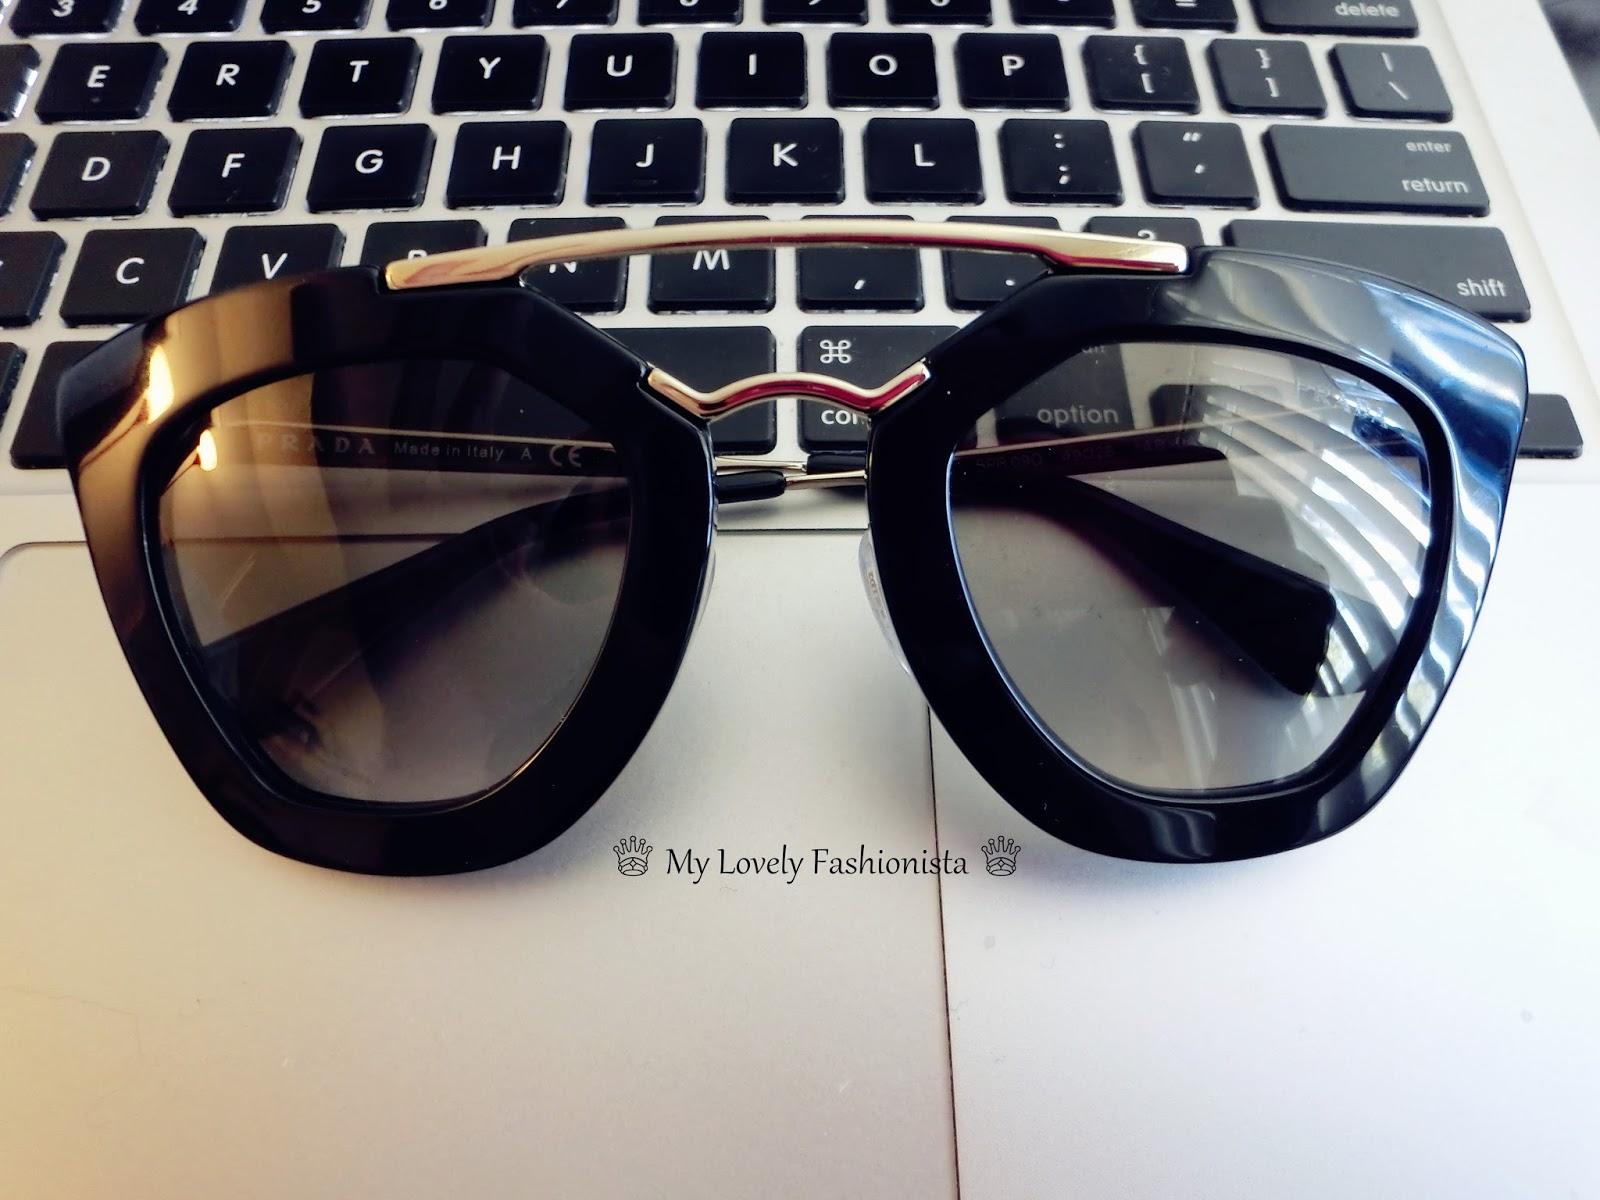 a9d7c668911 Prada Cat Eye Sunglasses - ♕ My Lovely Fashionista ♕